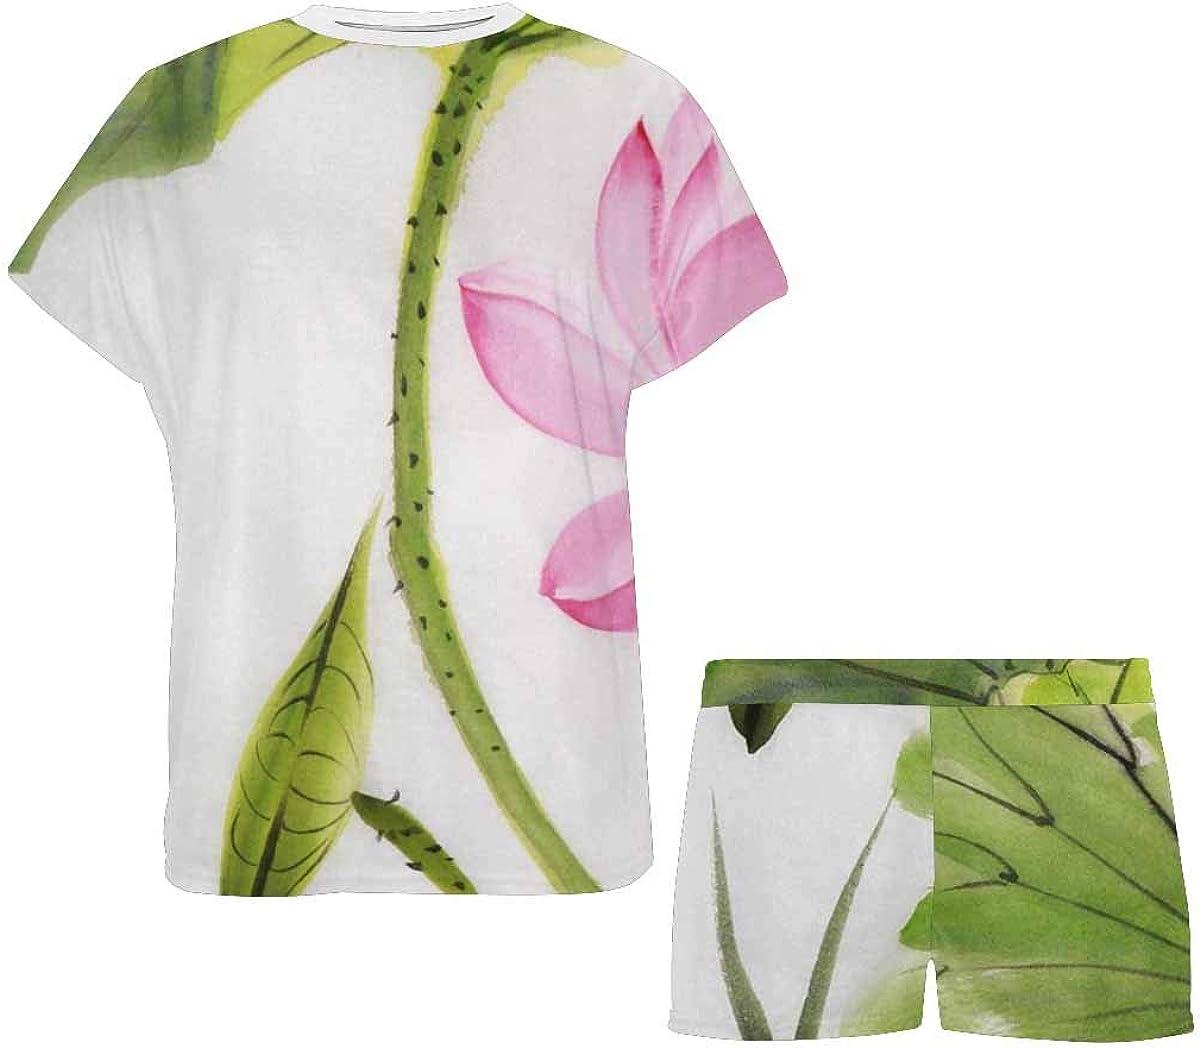 INTERESTPRINT Lotus and Dragonfly Women's Pajamas Short Sets Round Neck Short Sleeve Sleepwear